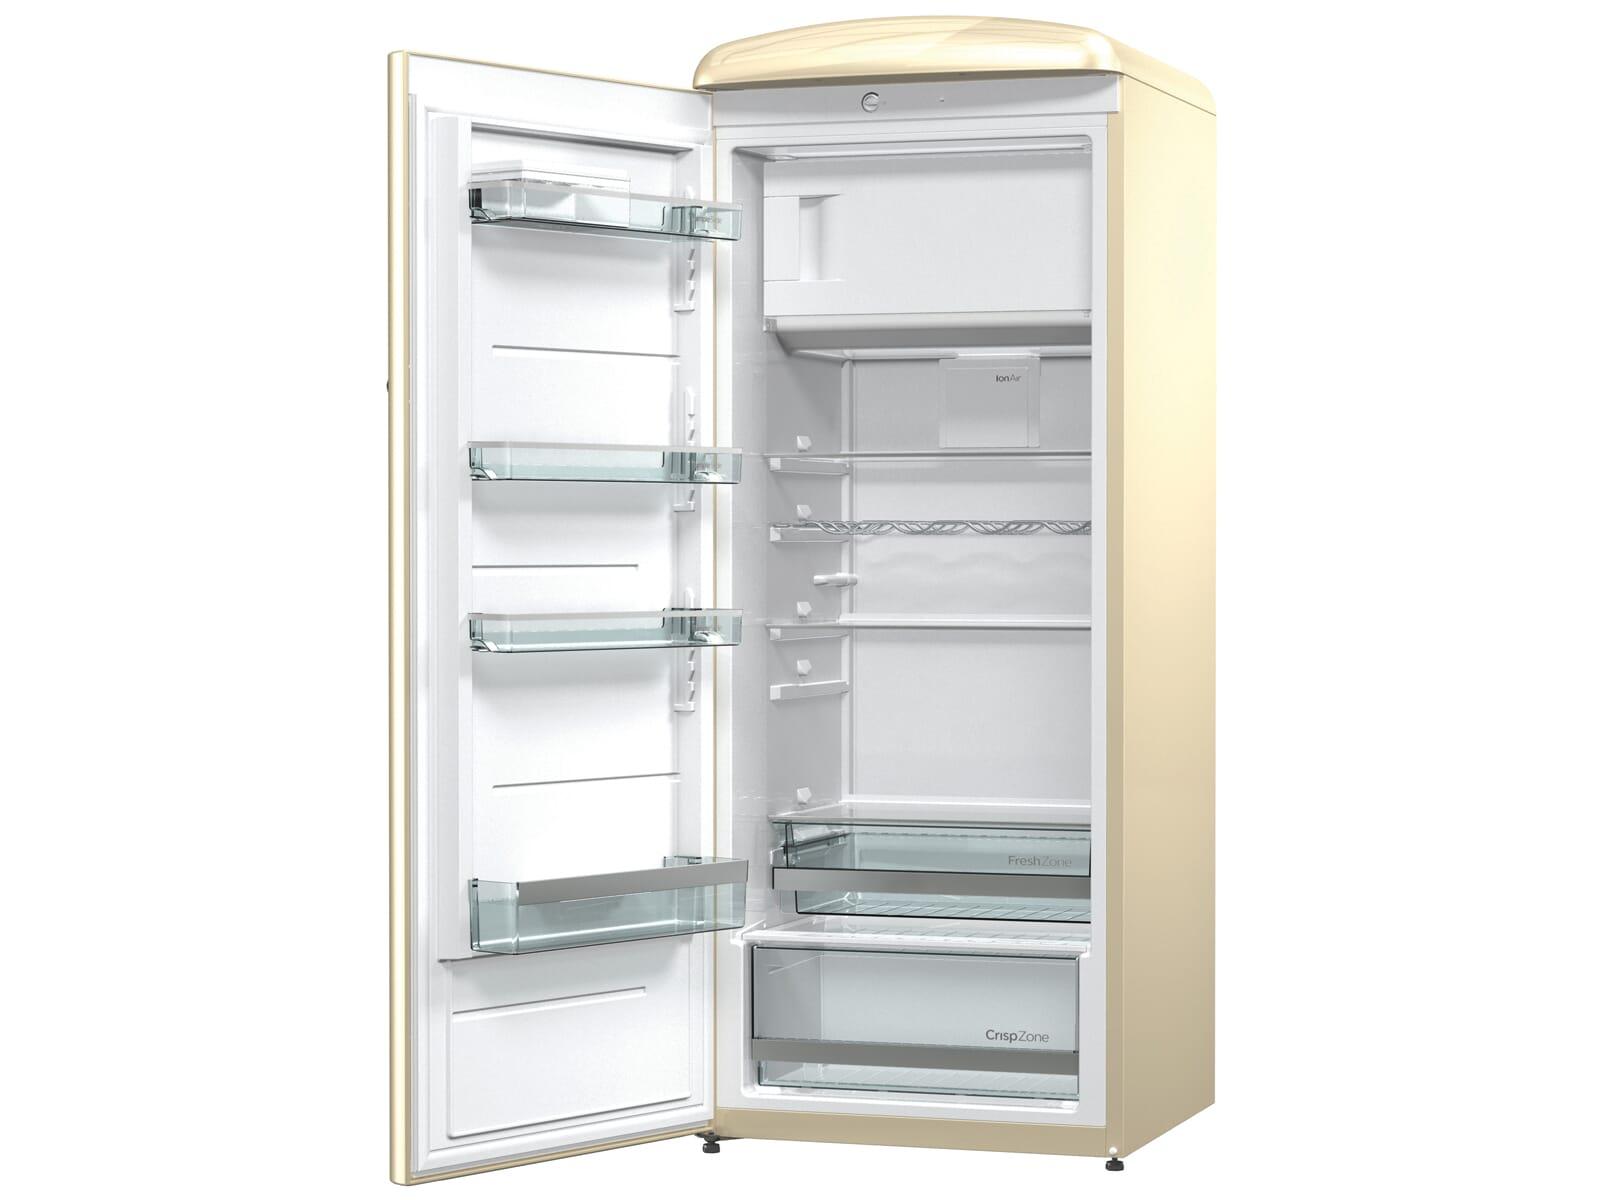 Gorenje Kühlschrank Ion Air : Gorenje orb c l standkühlschrank champagne